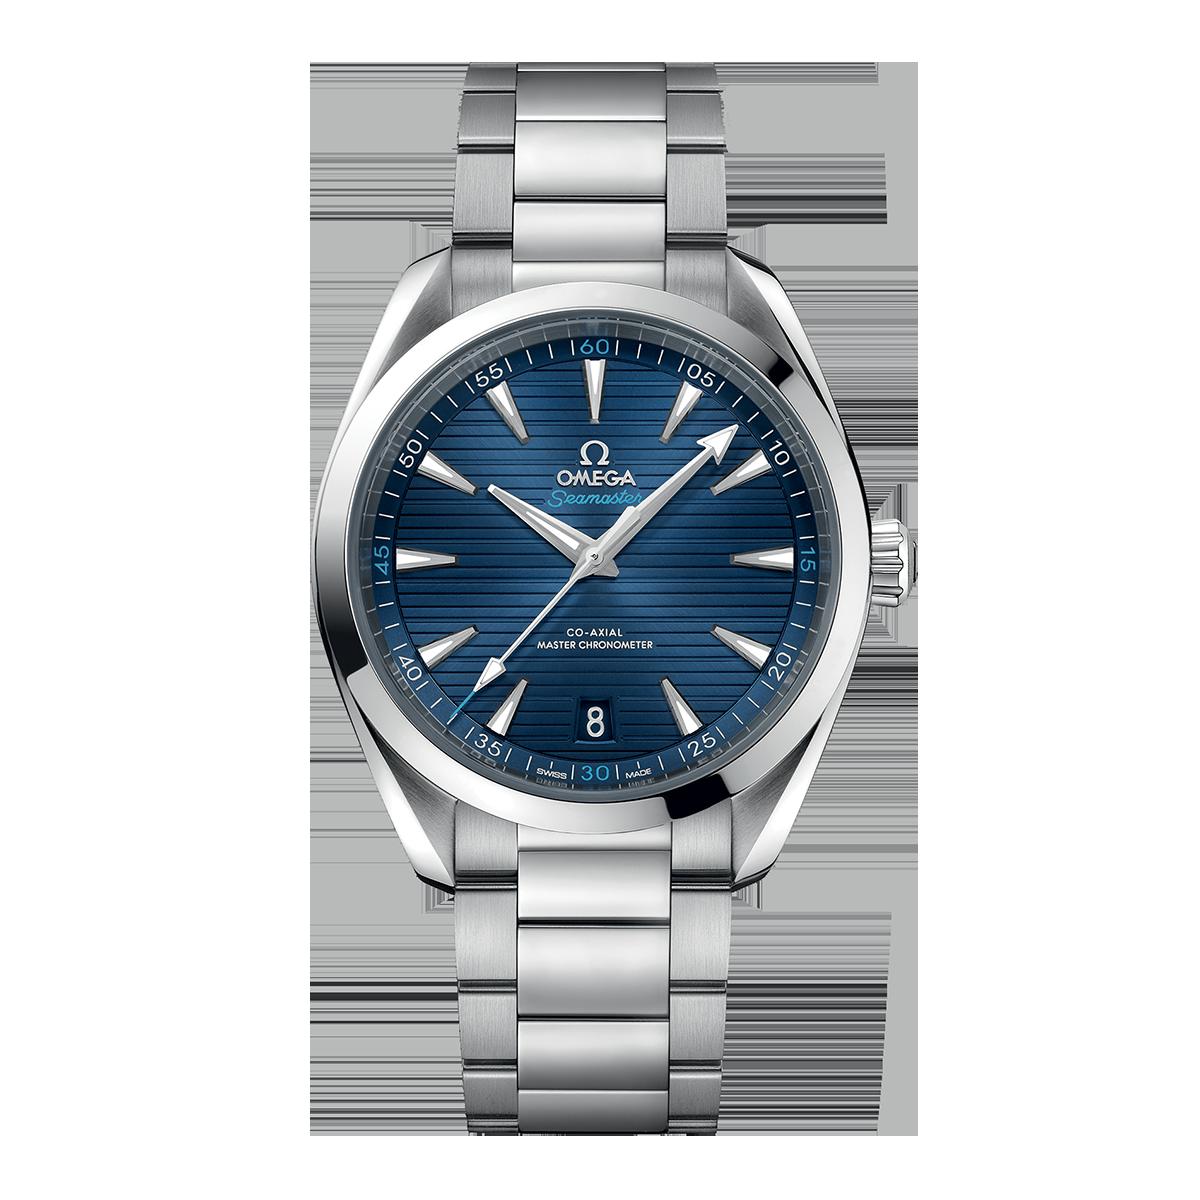 omega-seamaster-aqua-terra-150m-omega-co-axial-41-mm-22010412103001-1_hos Jarl Sandin